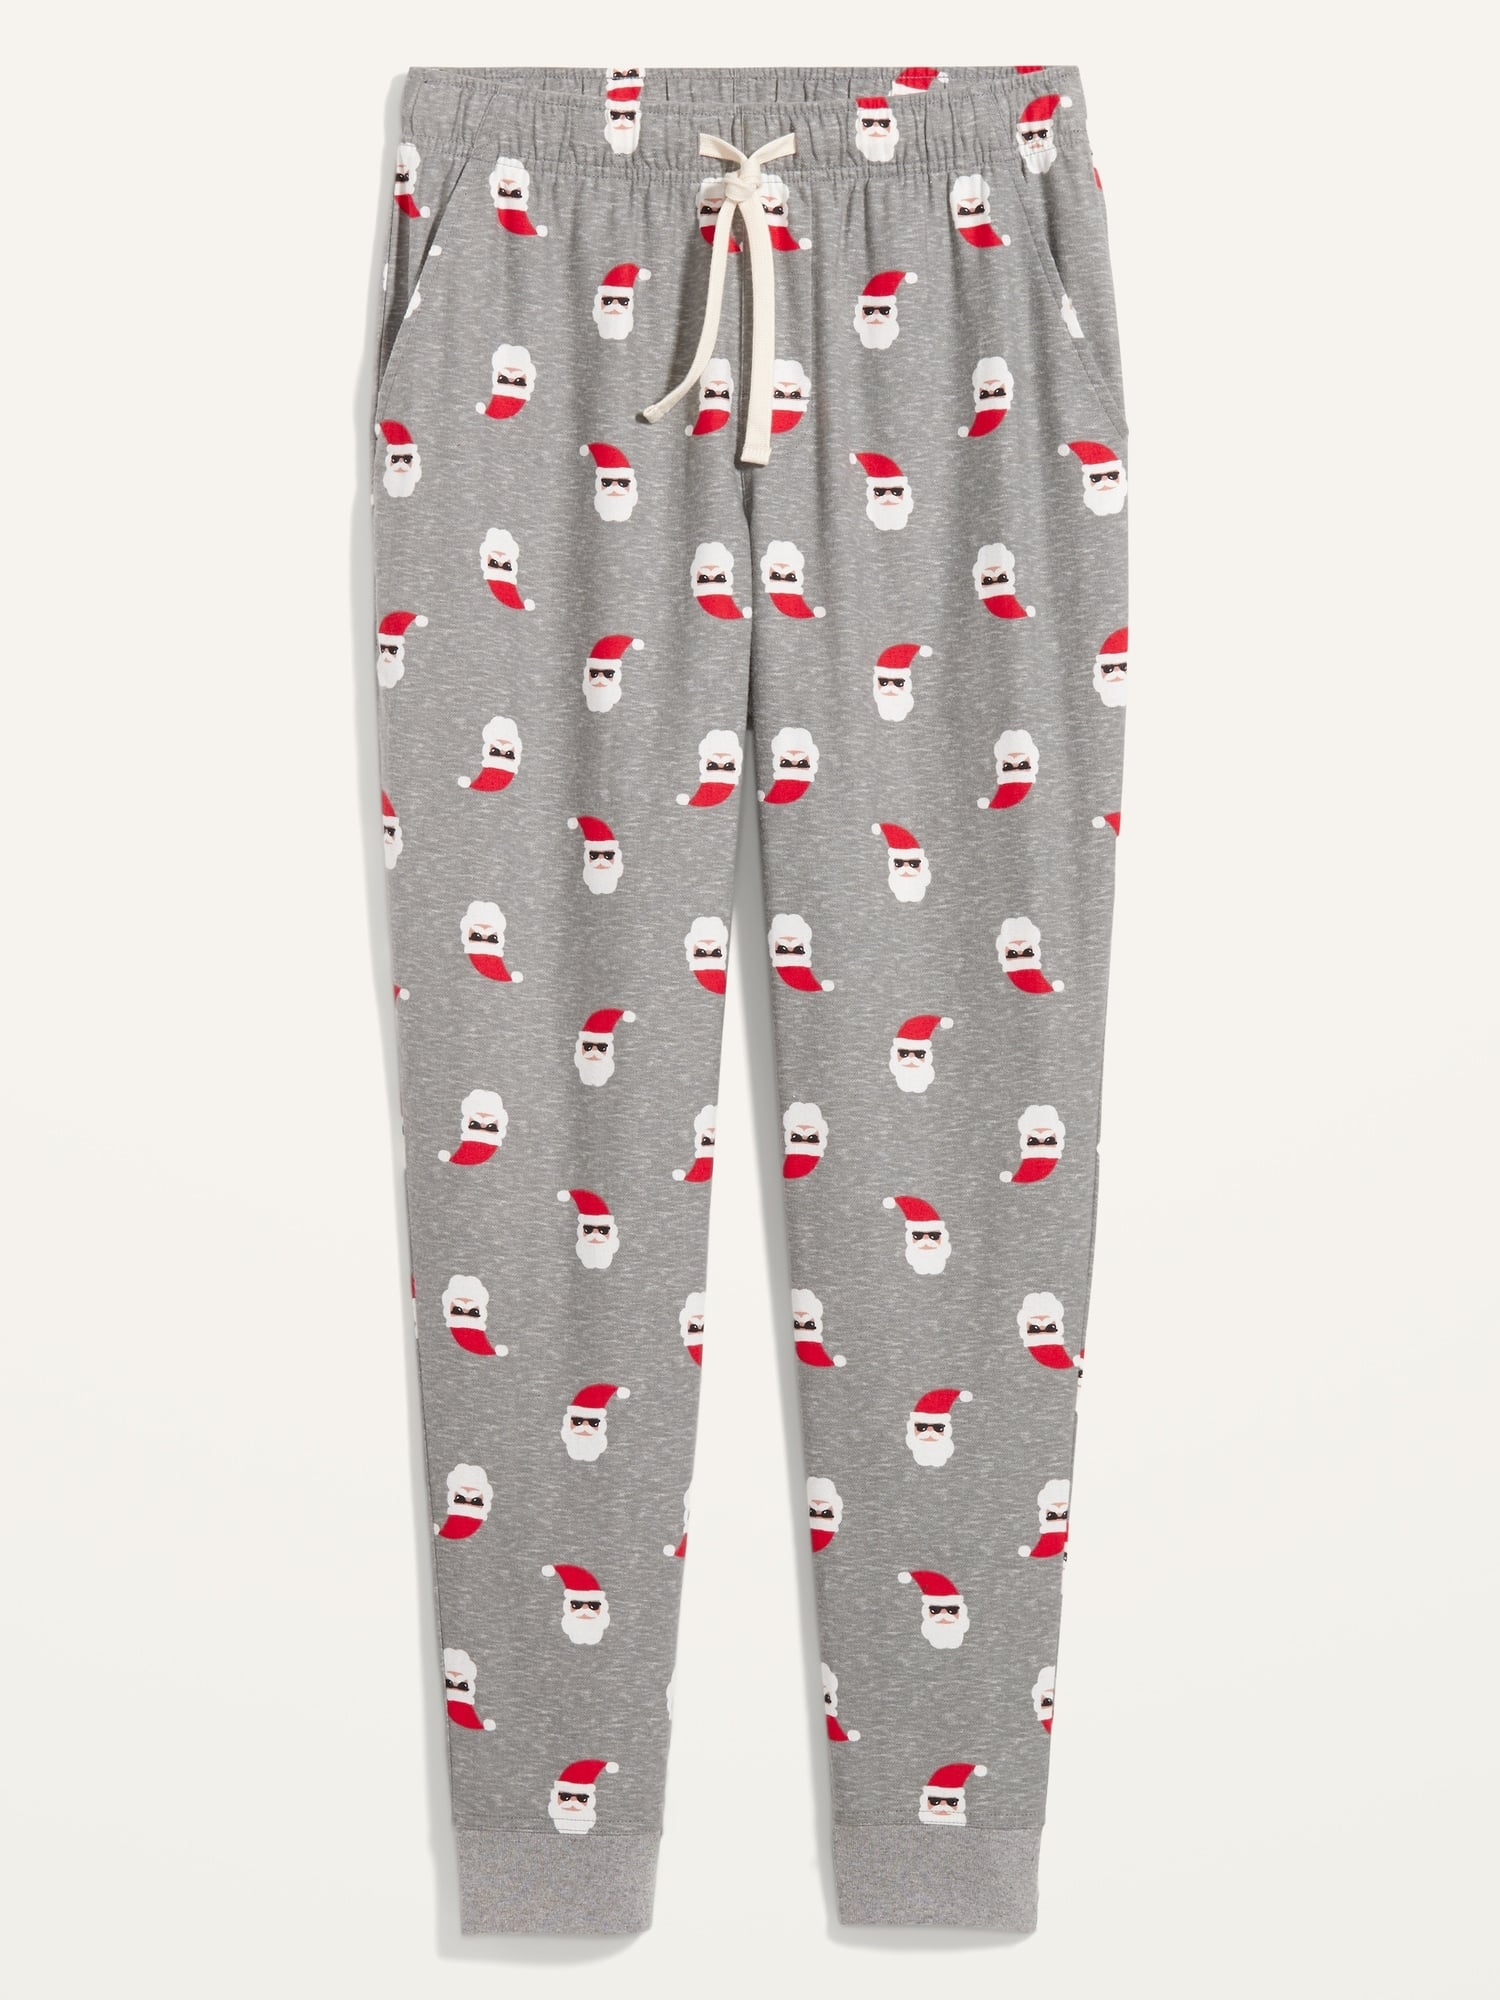 Med NWT Old Navy Mens Flannel Pajama Pants Holly Berries Holiday Xmas Navy